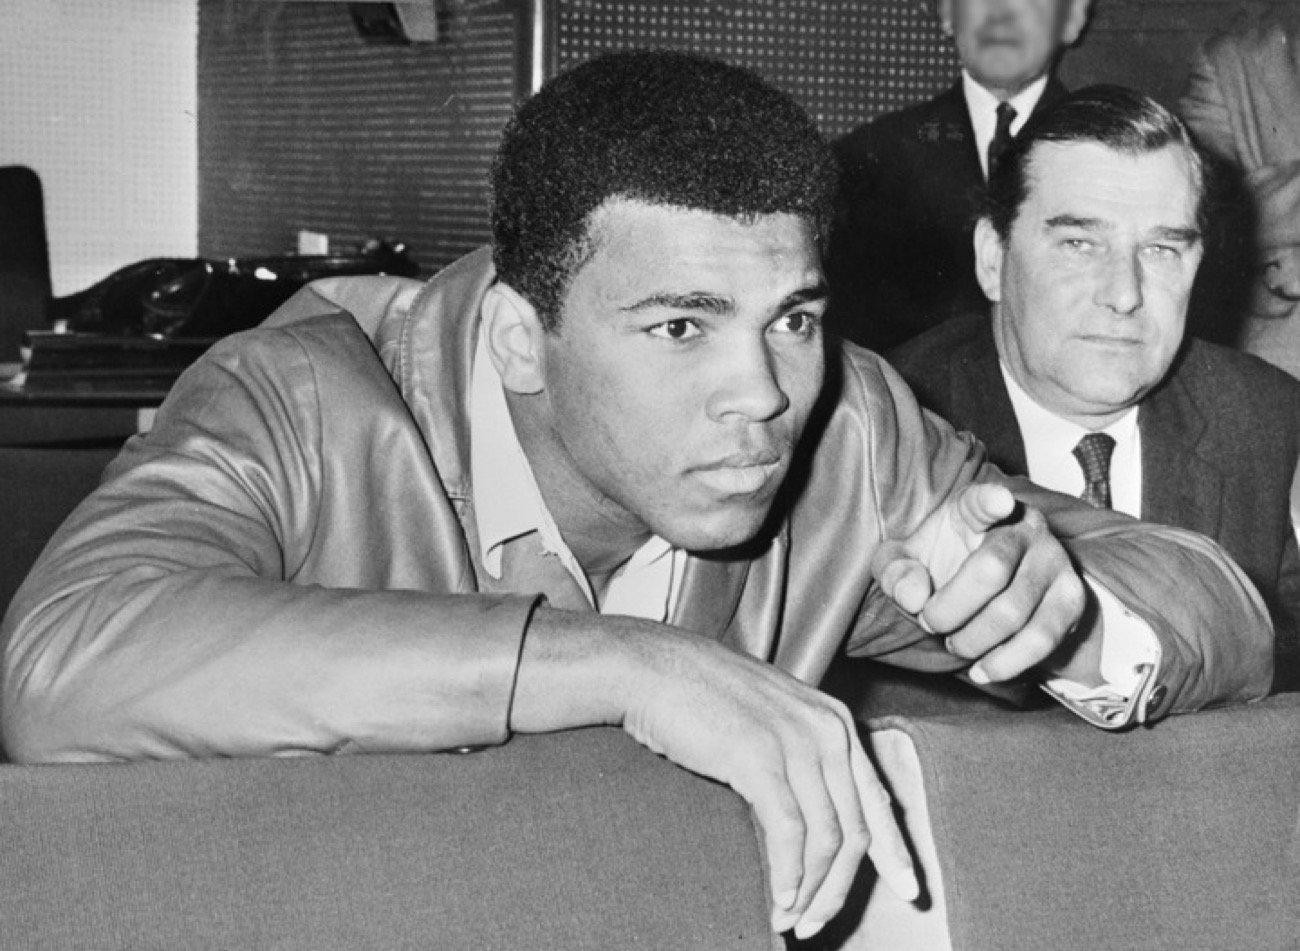 Jack Dempsey Joe Frazier Muhammad Ali